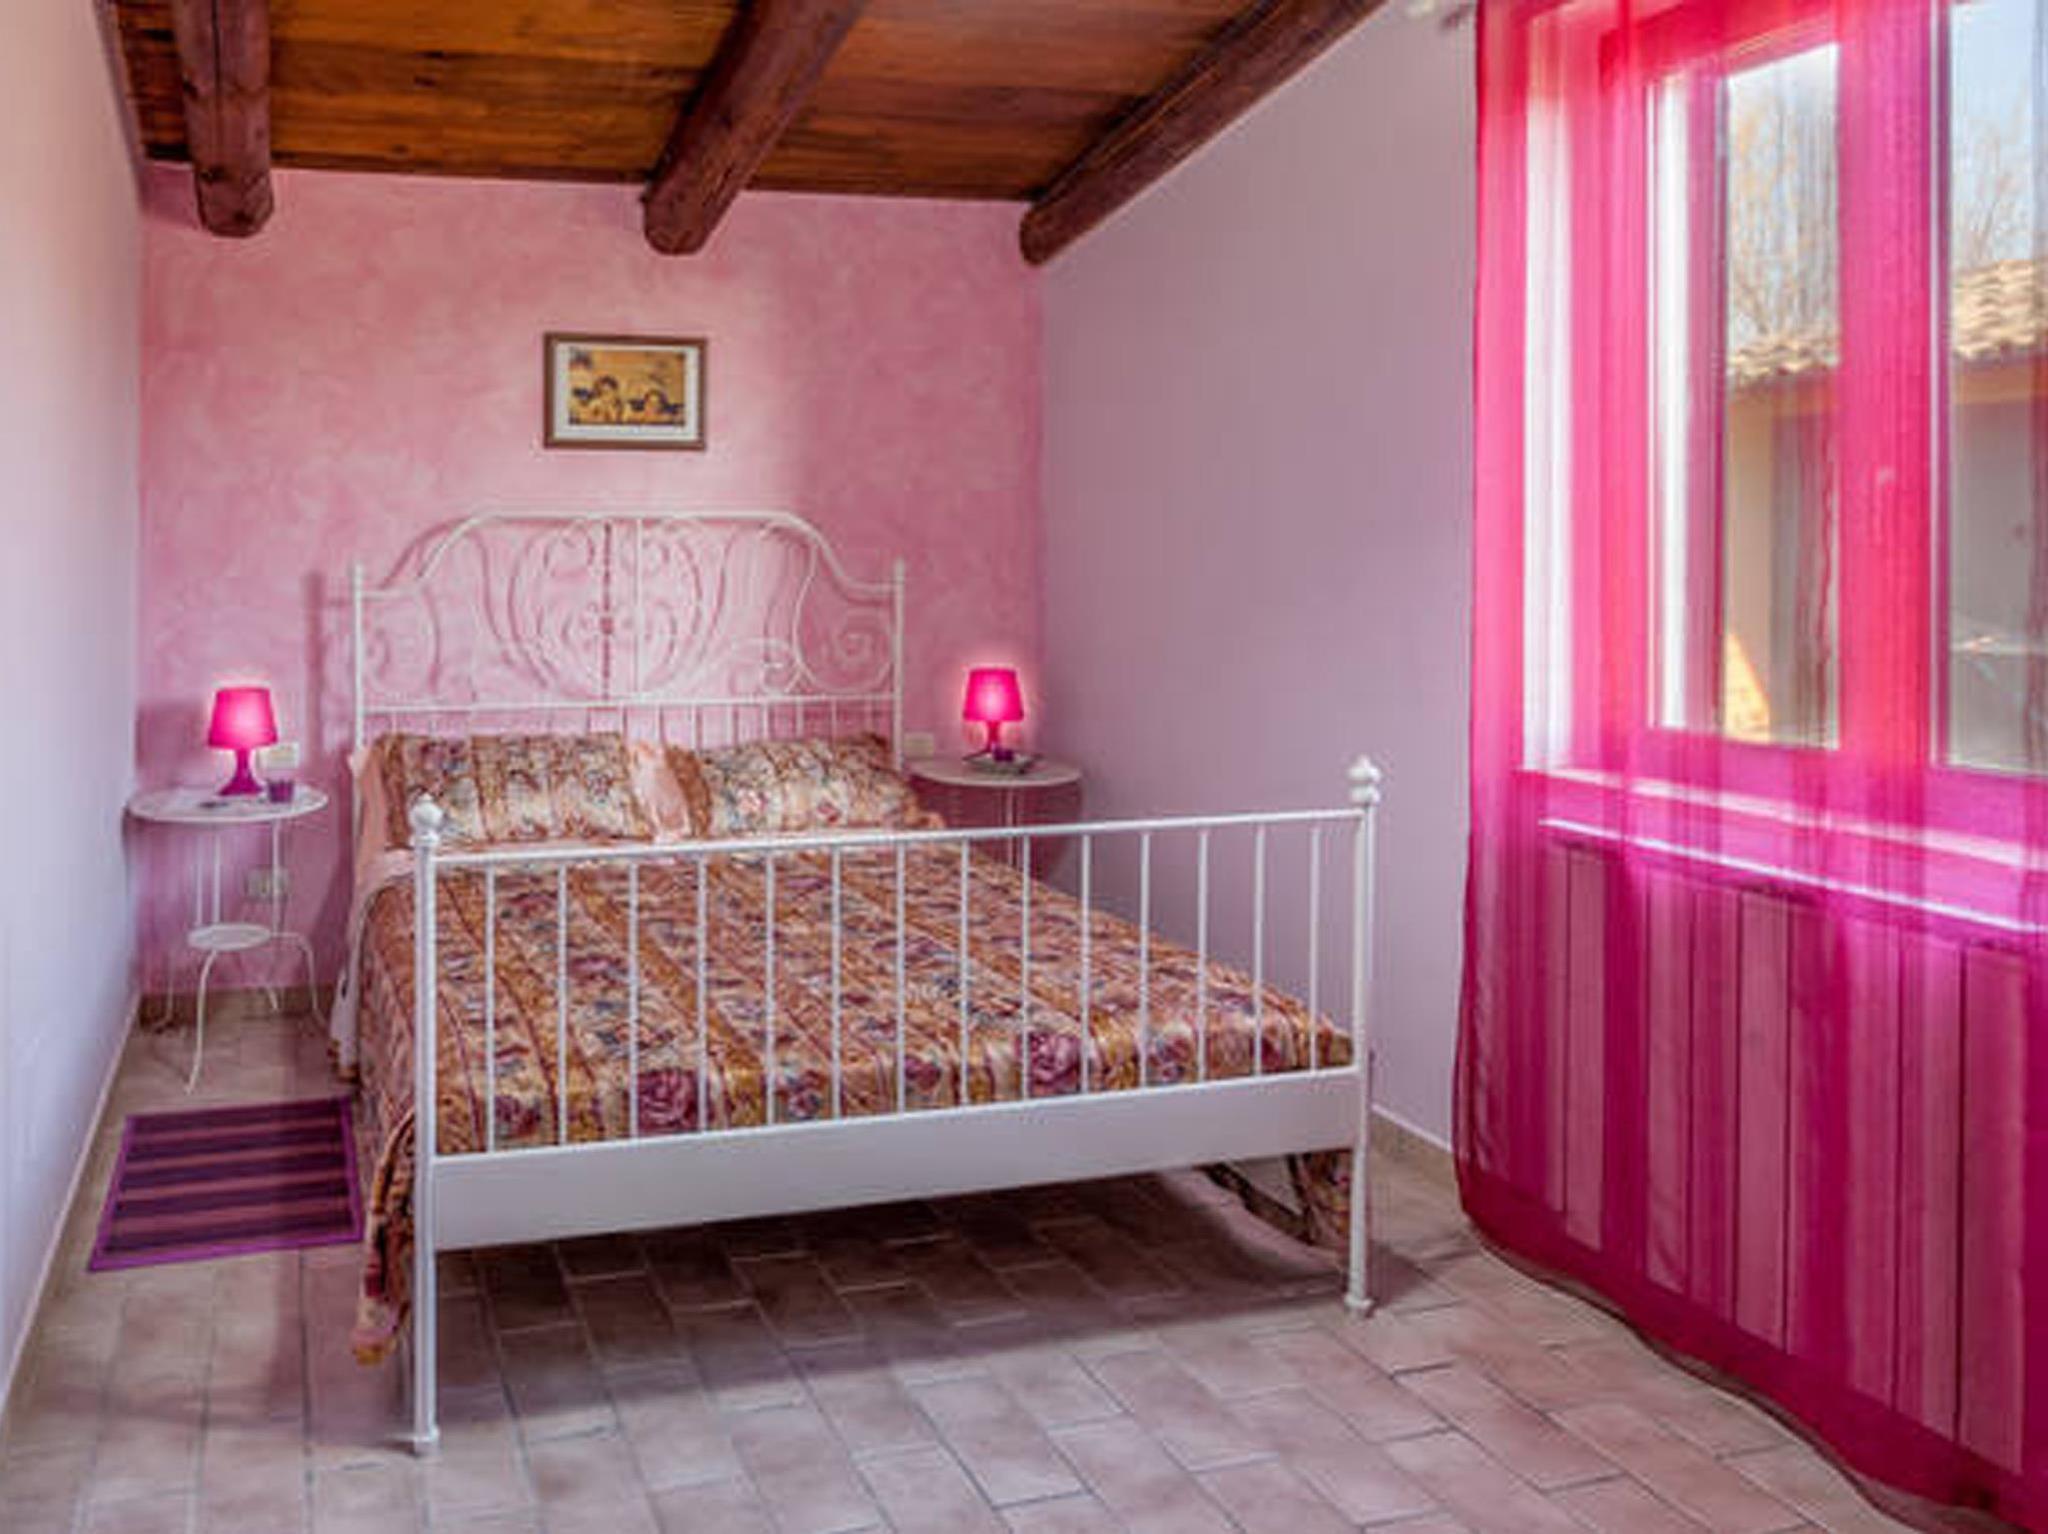 Le Betulle - appartamento vacanze, Perugia